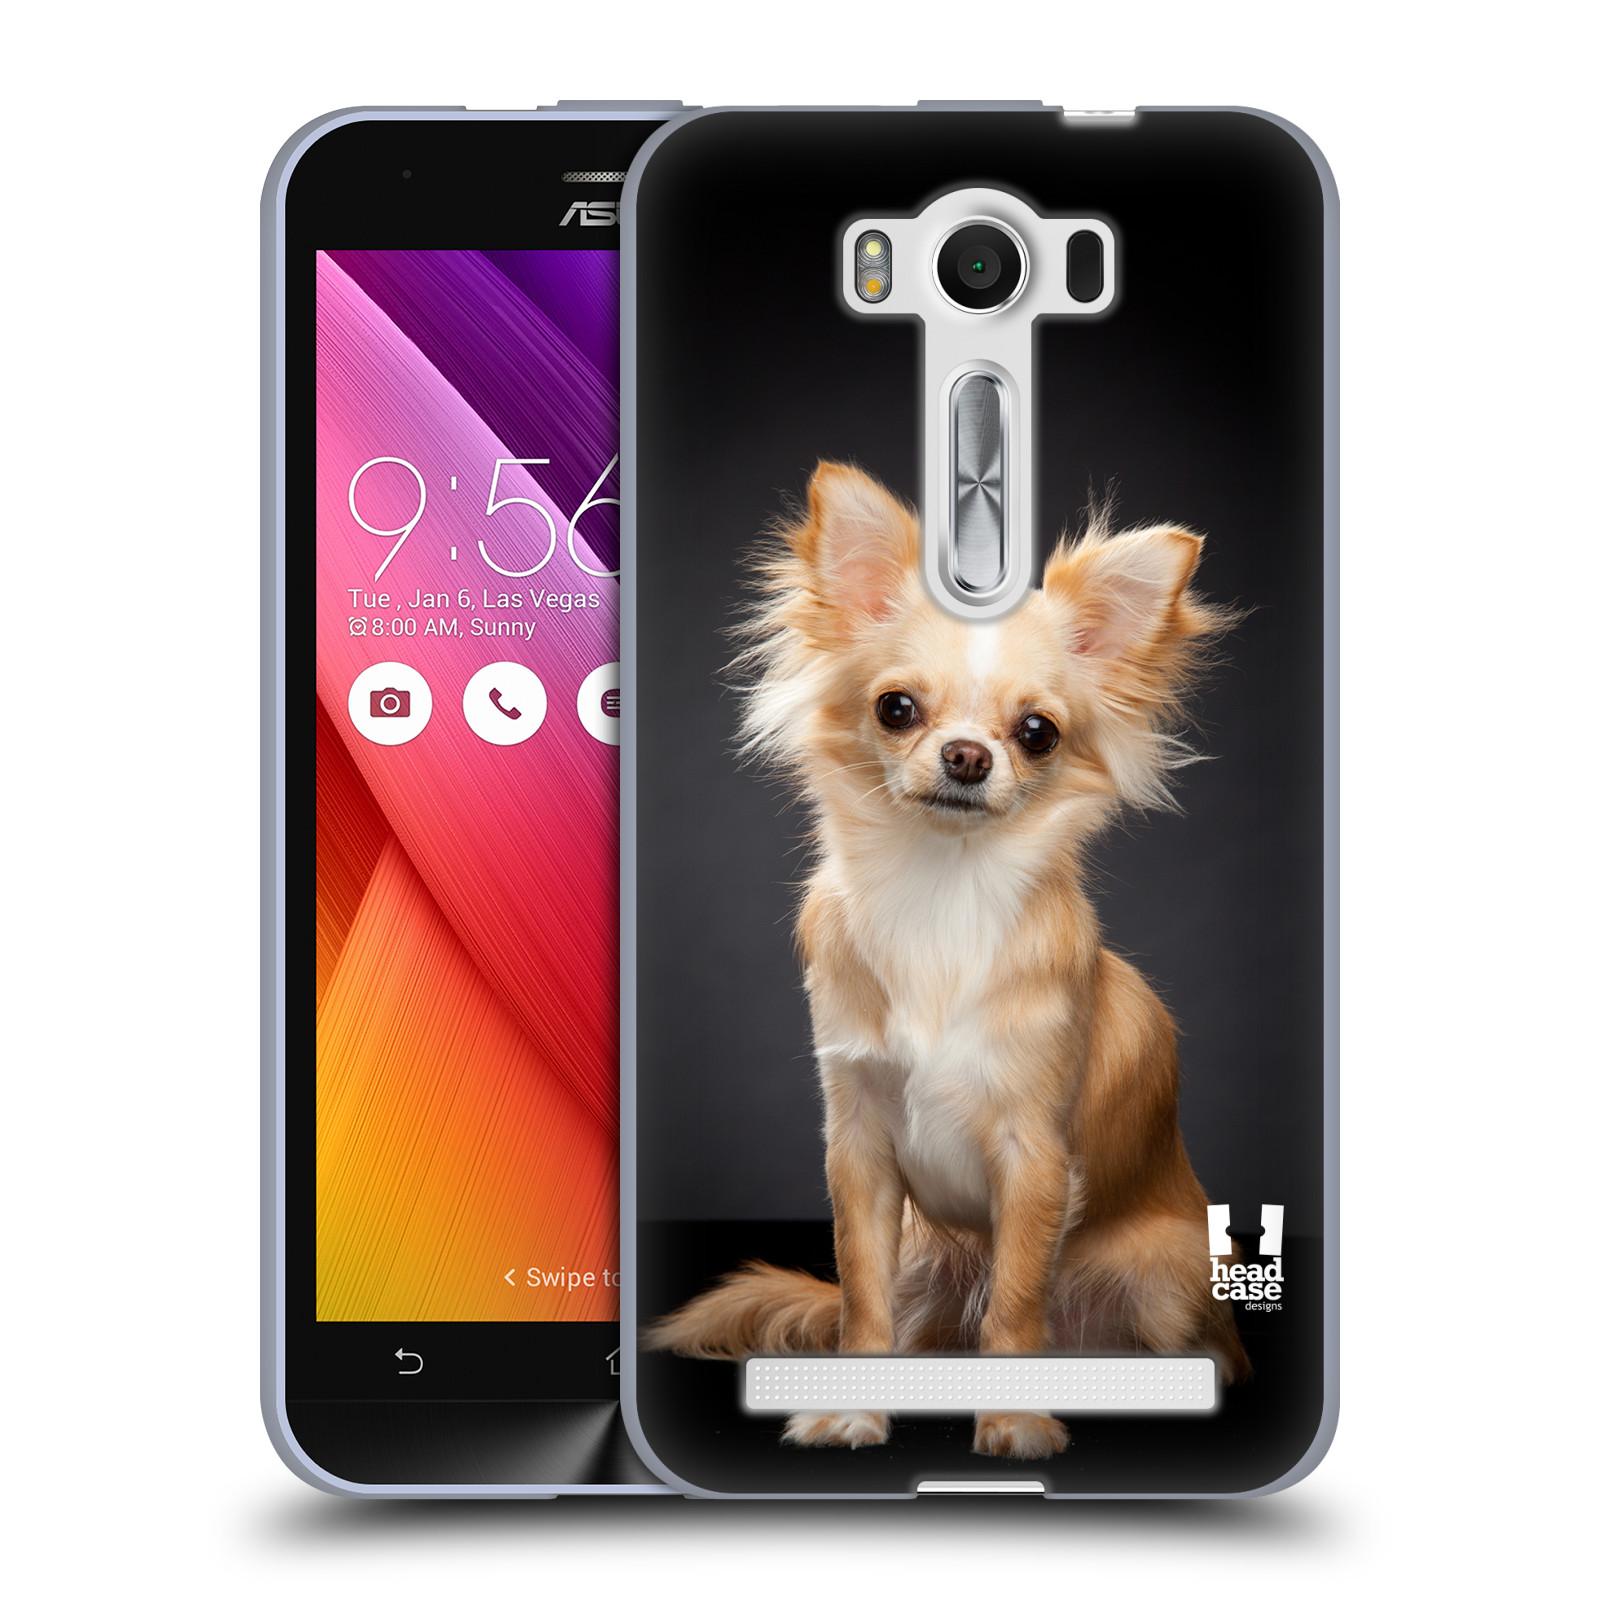 "Silikonové pouzdro na mobil Asus ZenFone 2 Laser ZE500KL HEAD CASE ČIVAVA (Silikonový kryt či obal na mobilní telefon Asus ZenFone 2 Laser ZE500KL s 5"" displejem)"